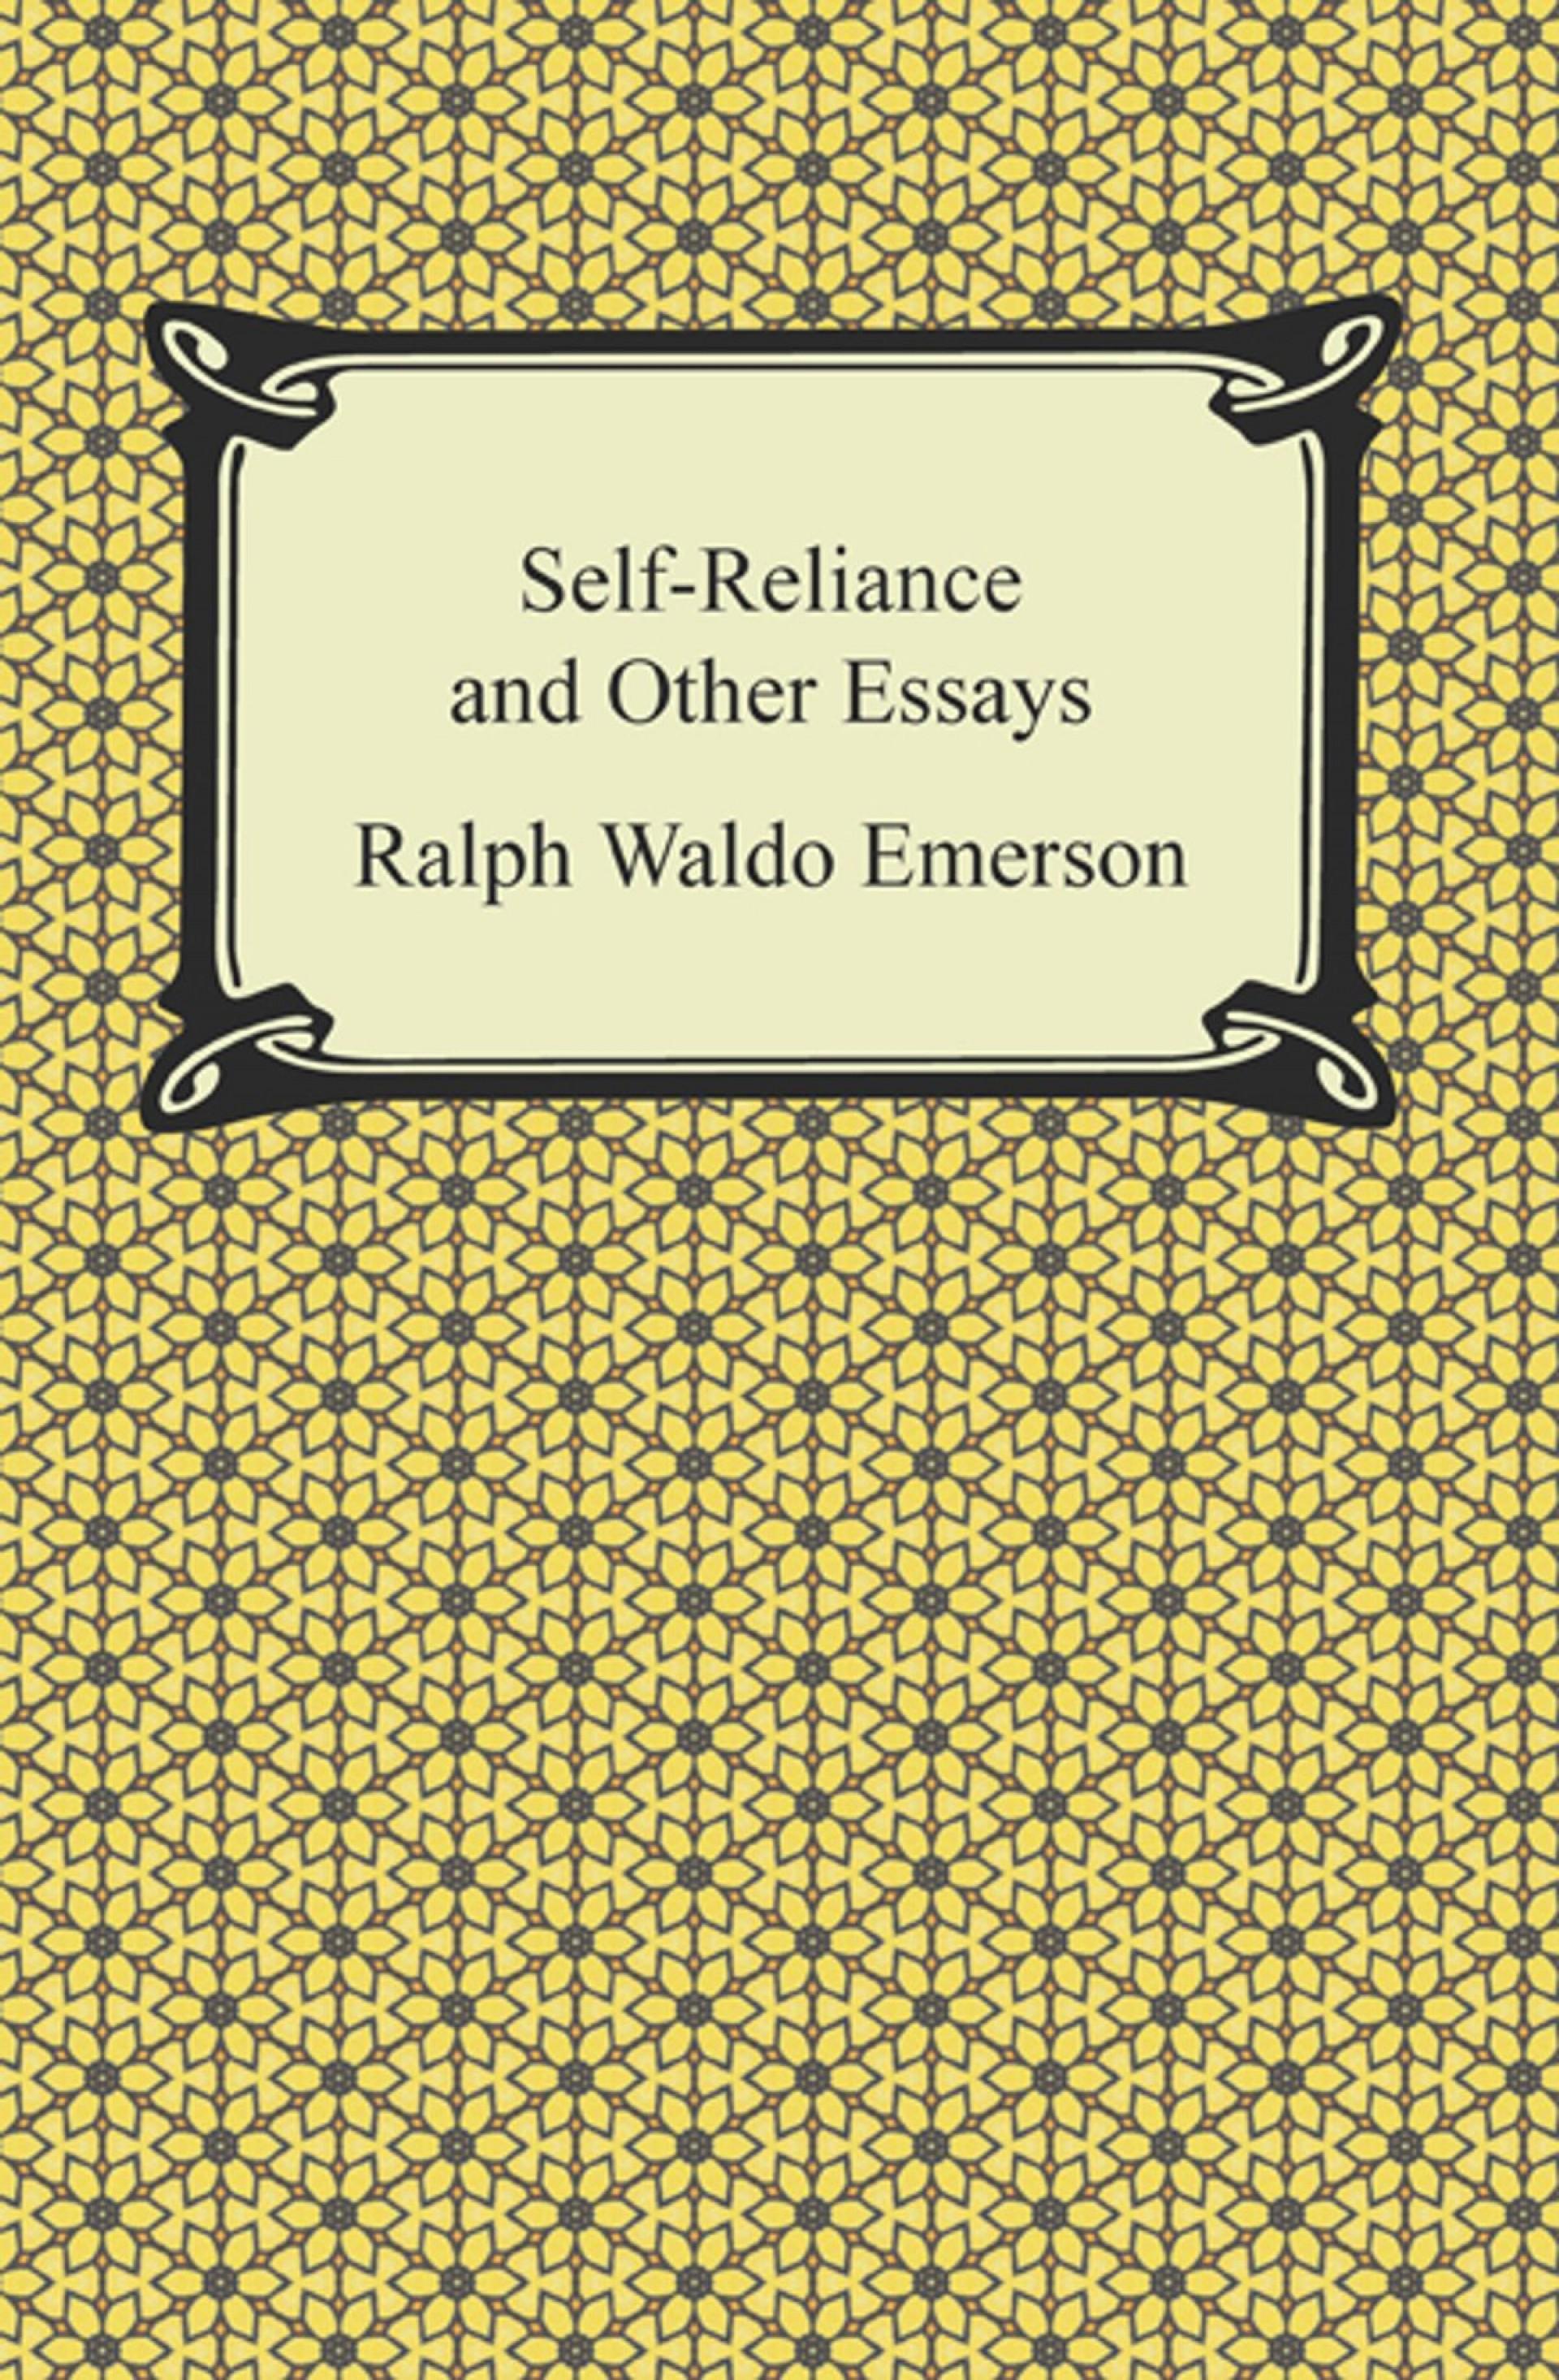 017 Self Reliance And Other Essays Essay Example Formidable Ralph Waldo Emerson Pdf Ekşi 1920